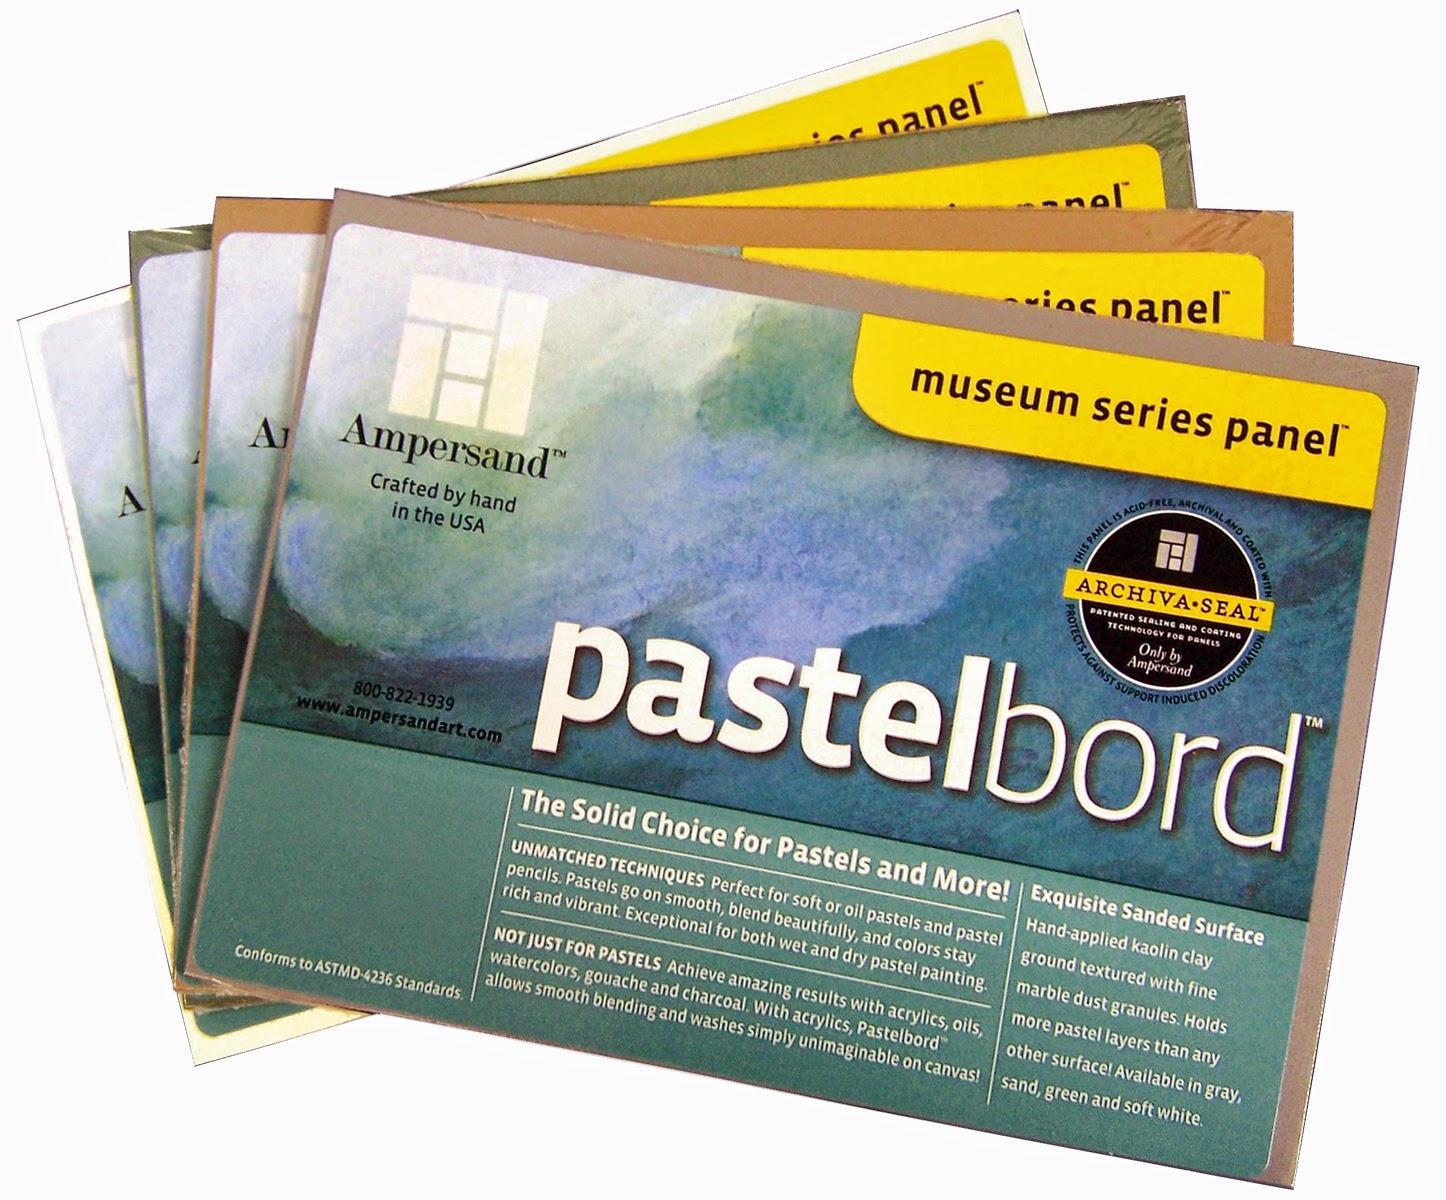 Pastelbord sampler